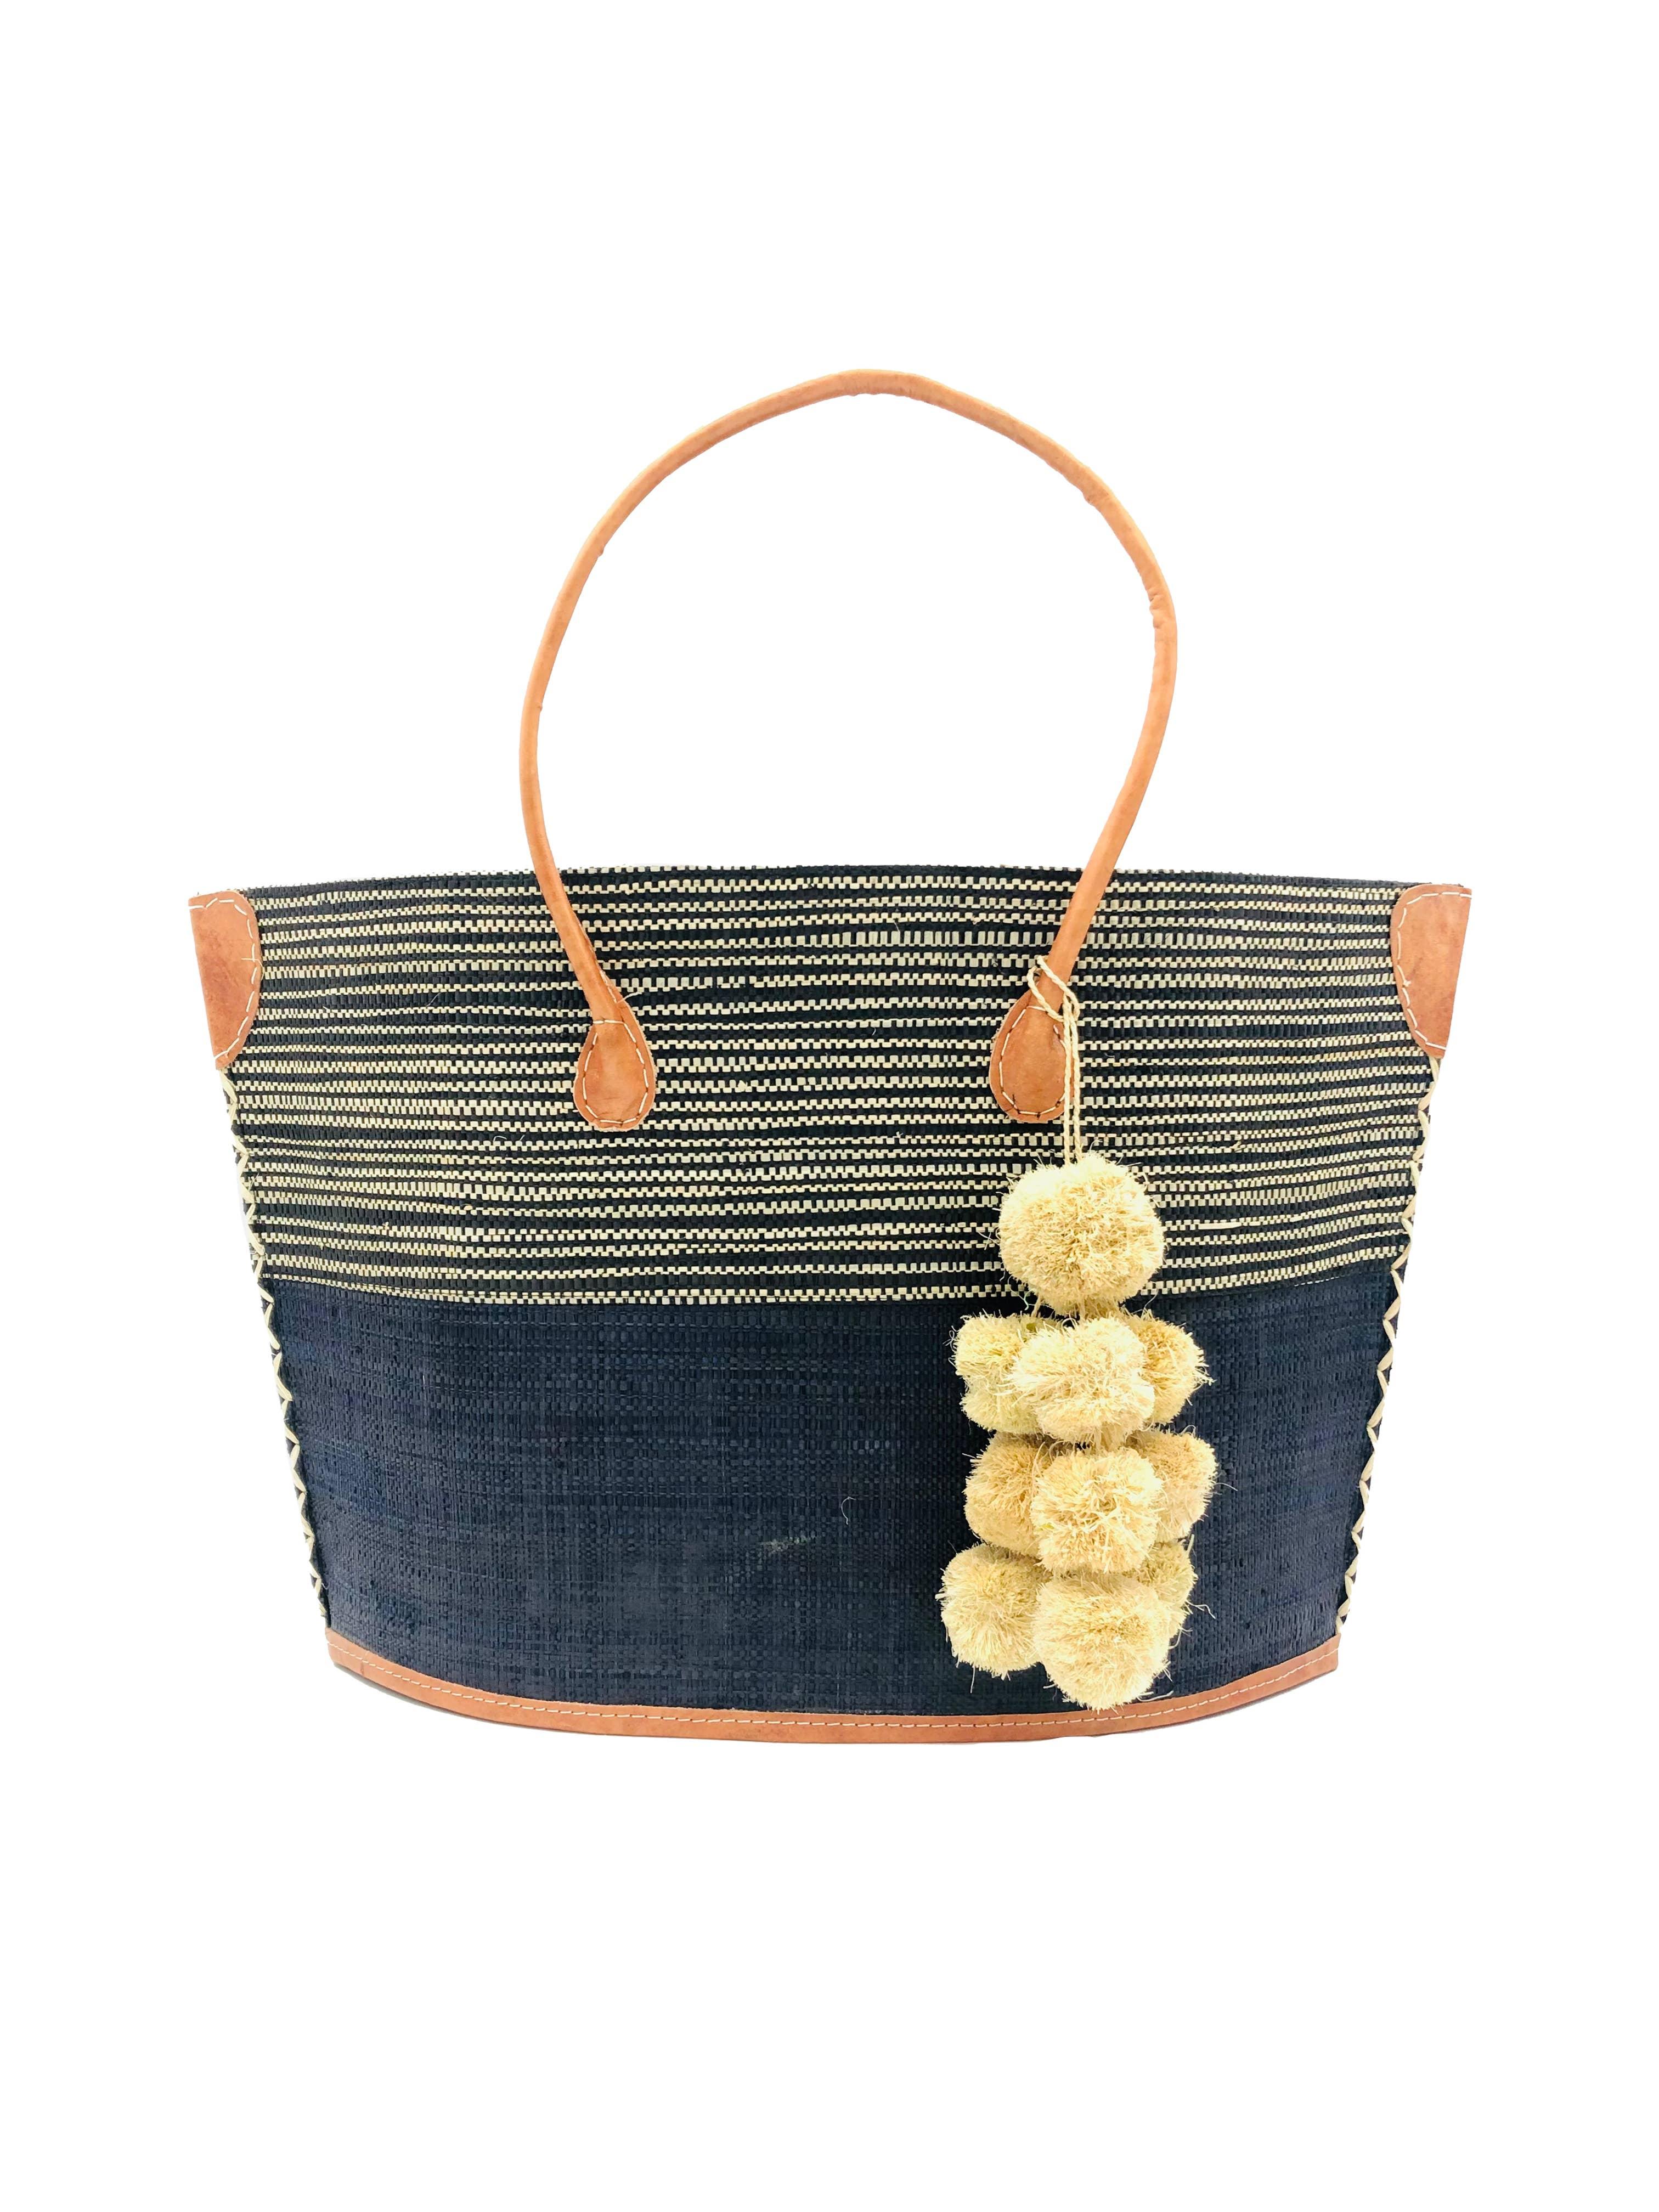 Manhattan Melange Two Tones Straw Bag | Trada Marketplace